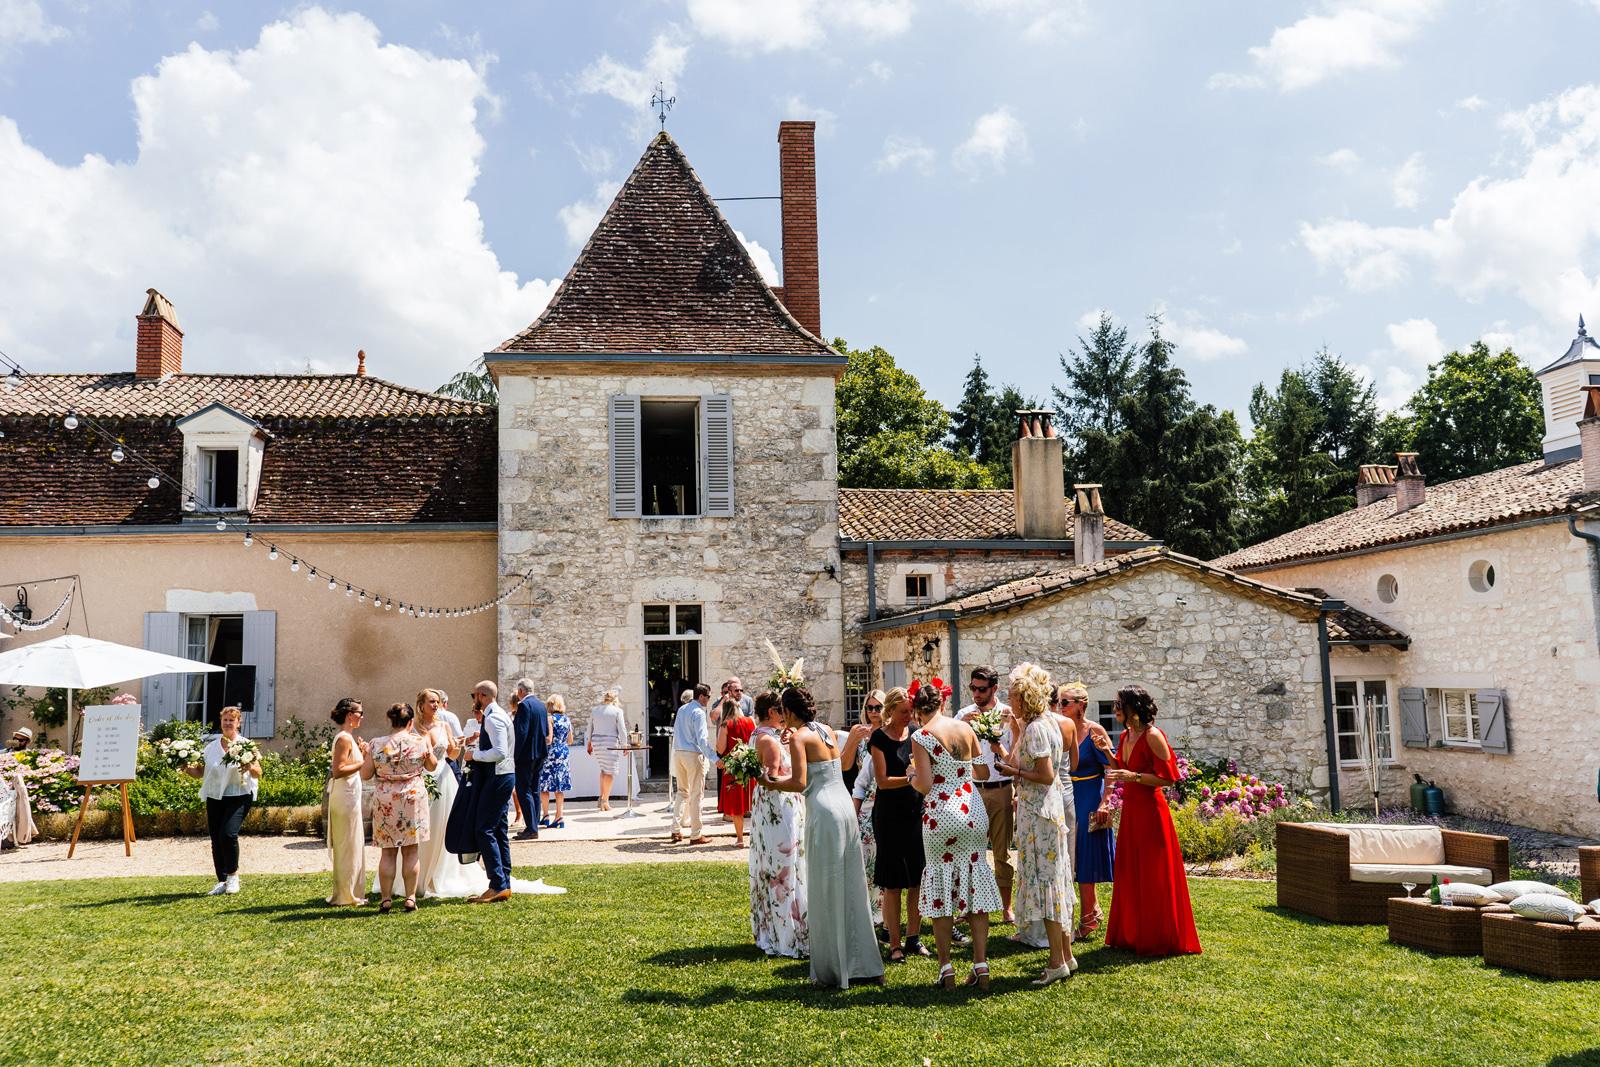 chateau lacanaud looking splendid in the summer sunshine